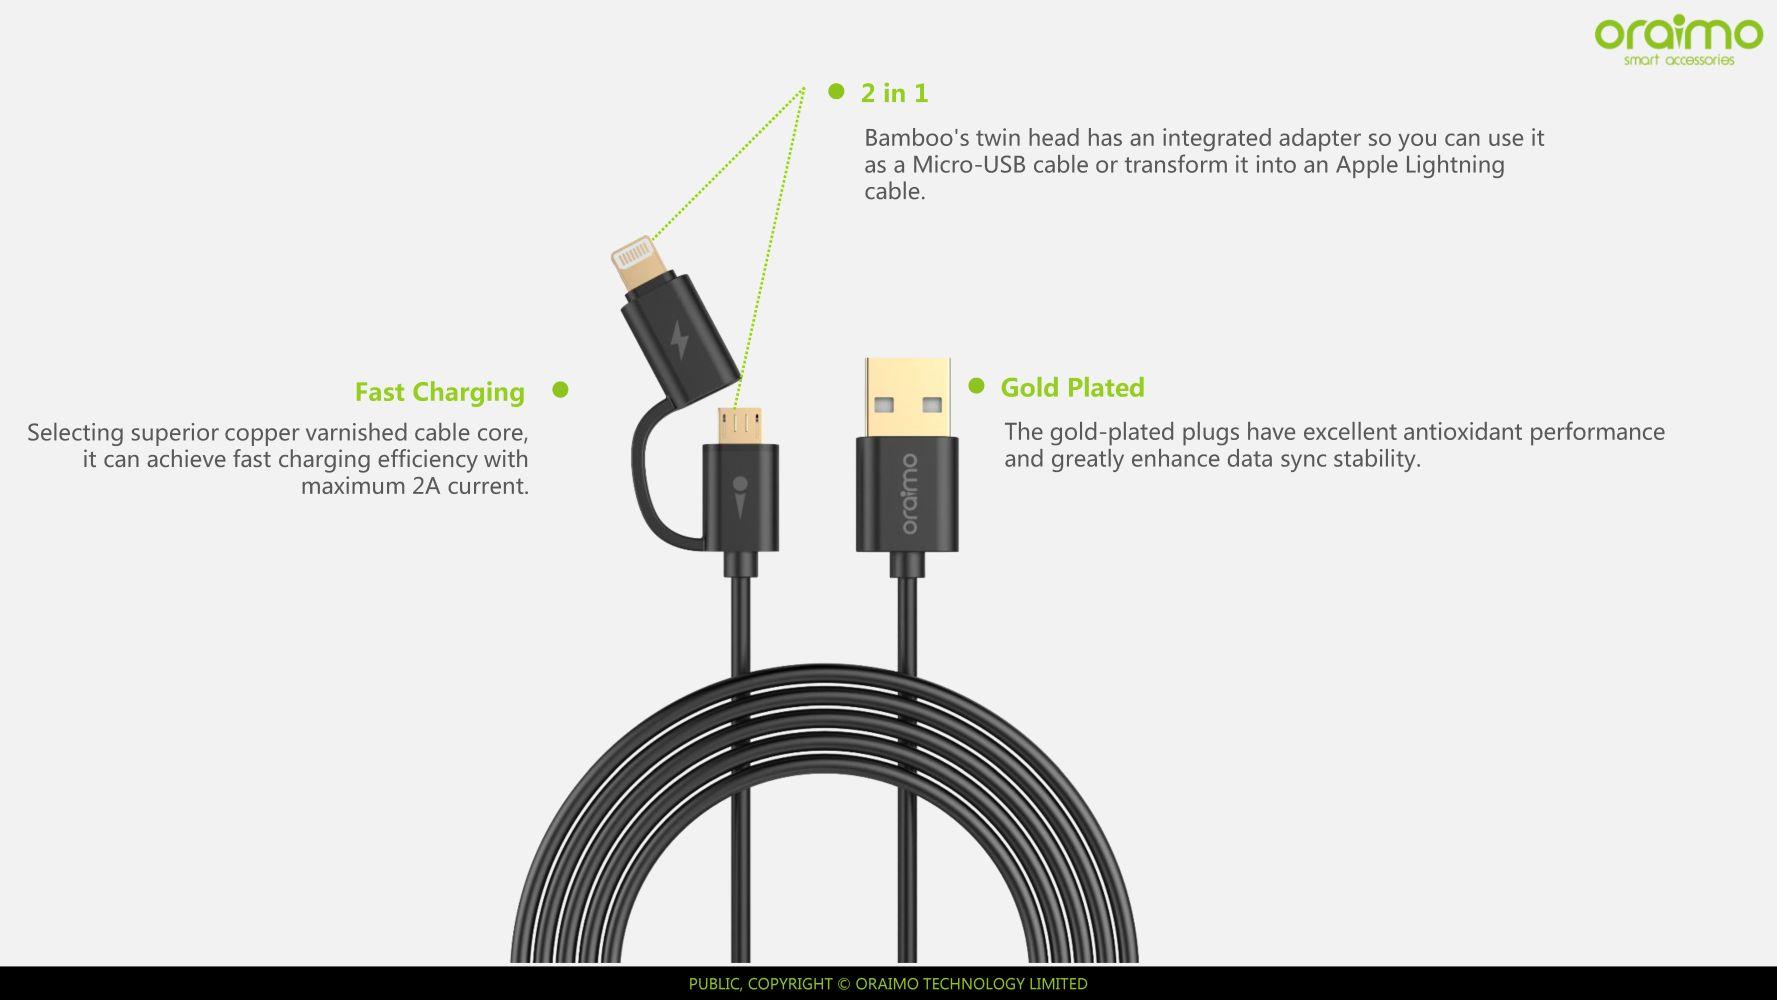 Oraimo Bamboo Twin Head Wire 1m Lighting Amp Micro Usb